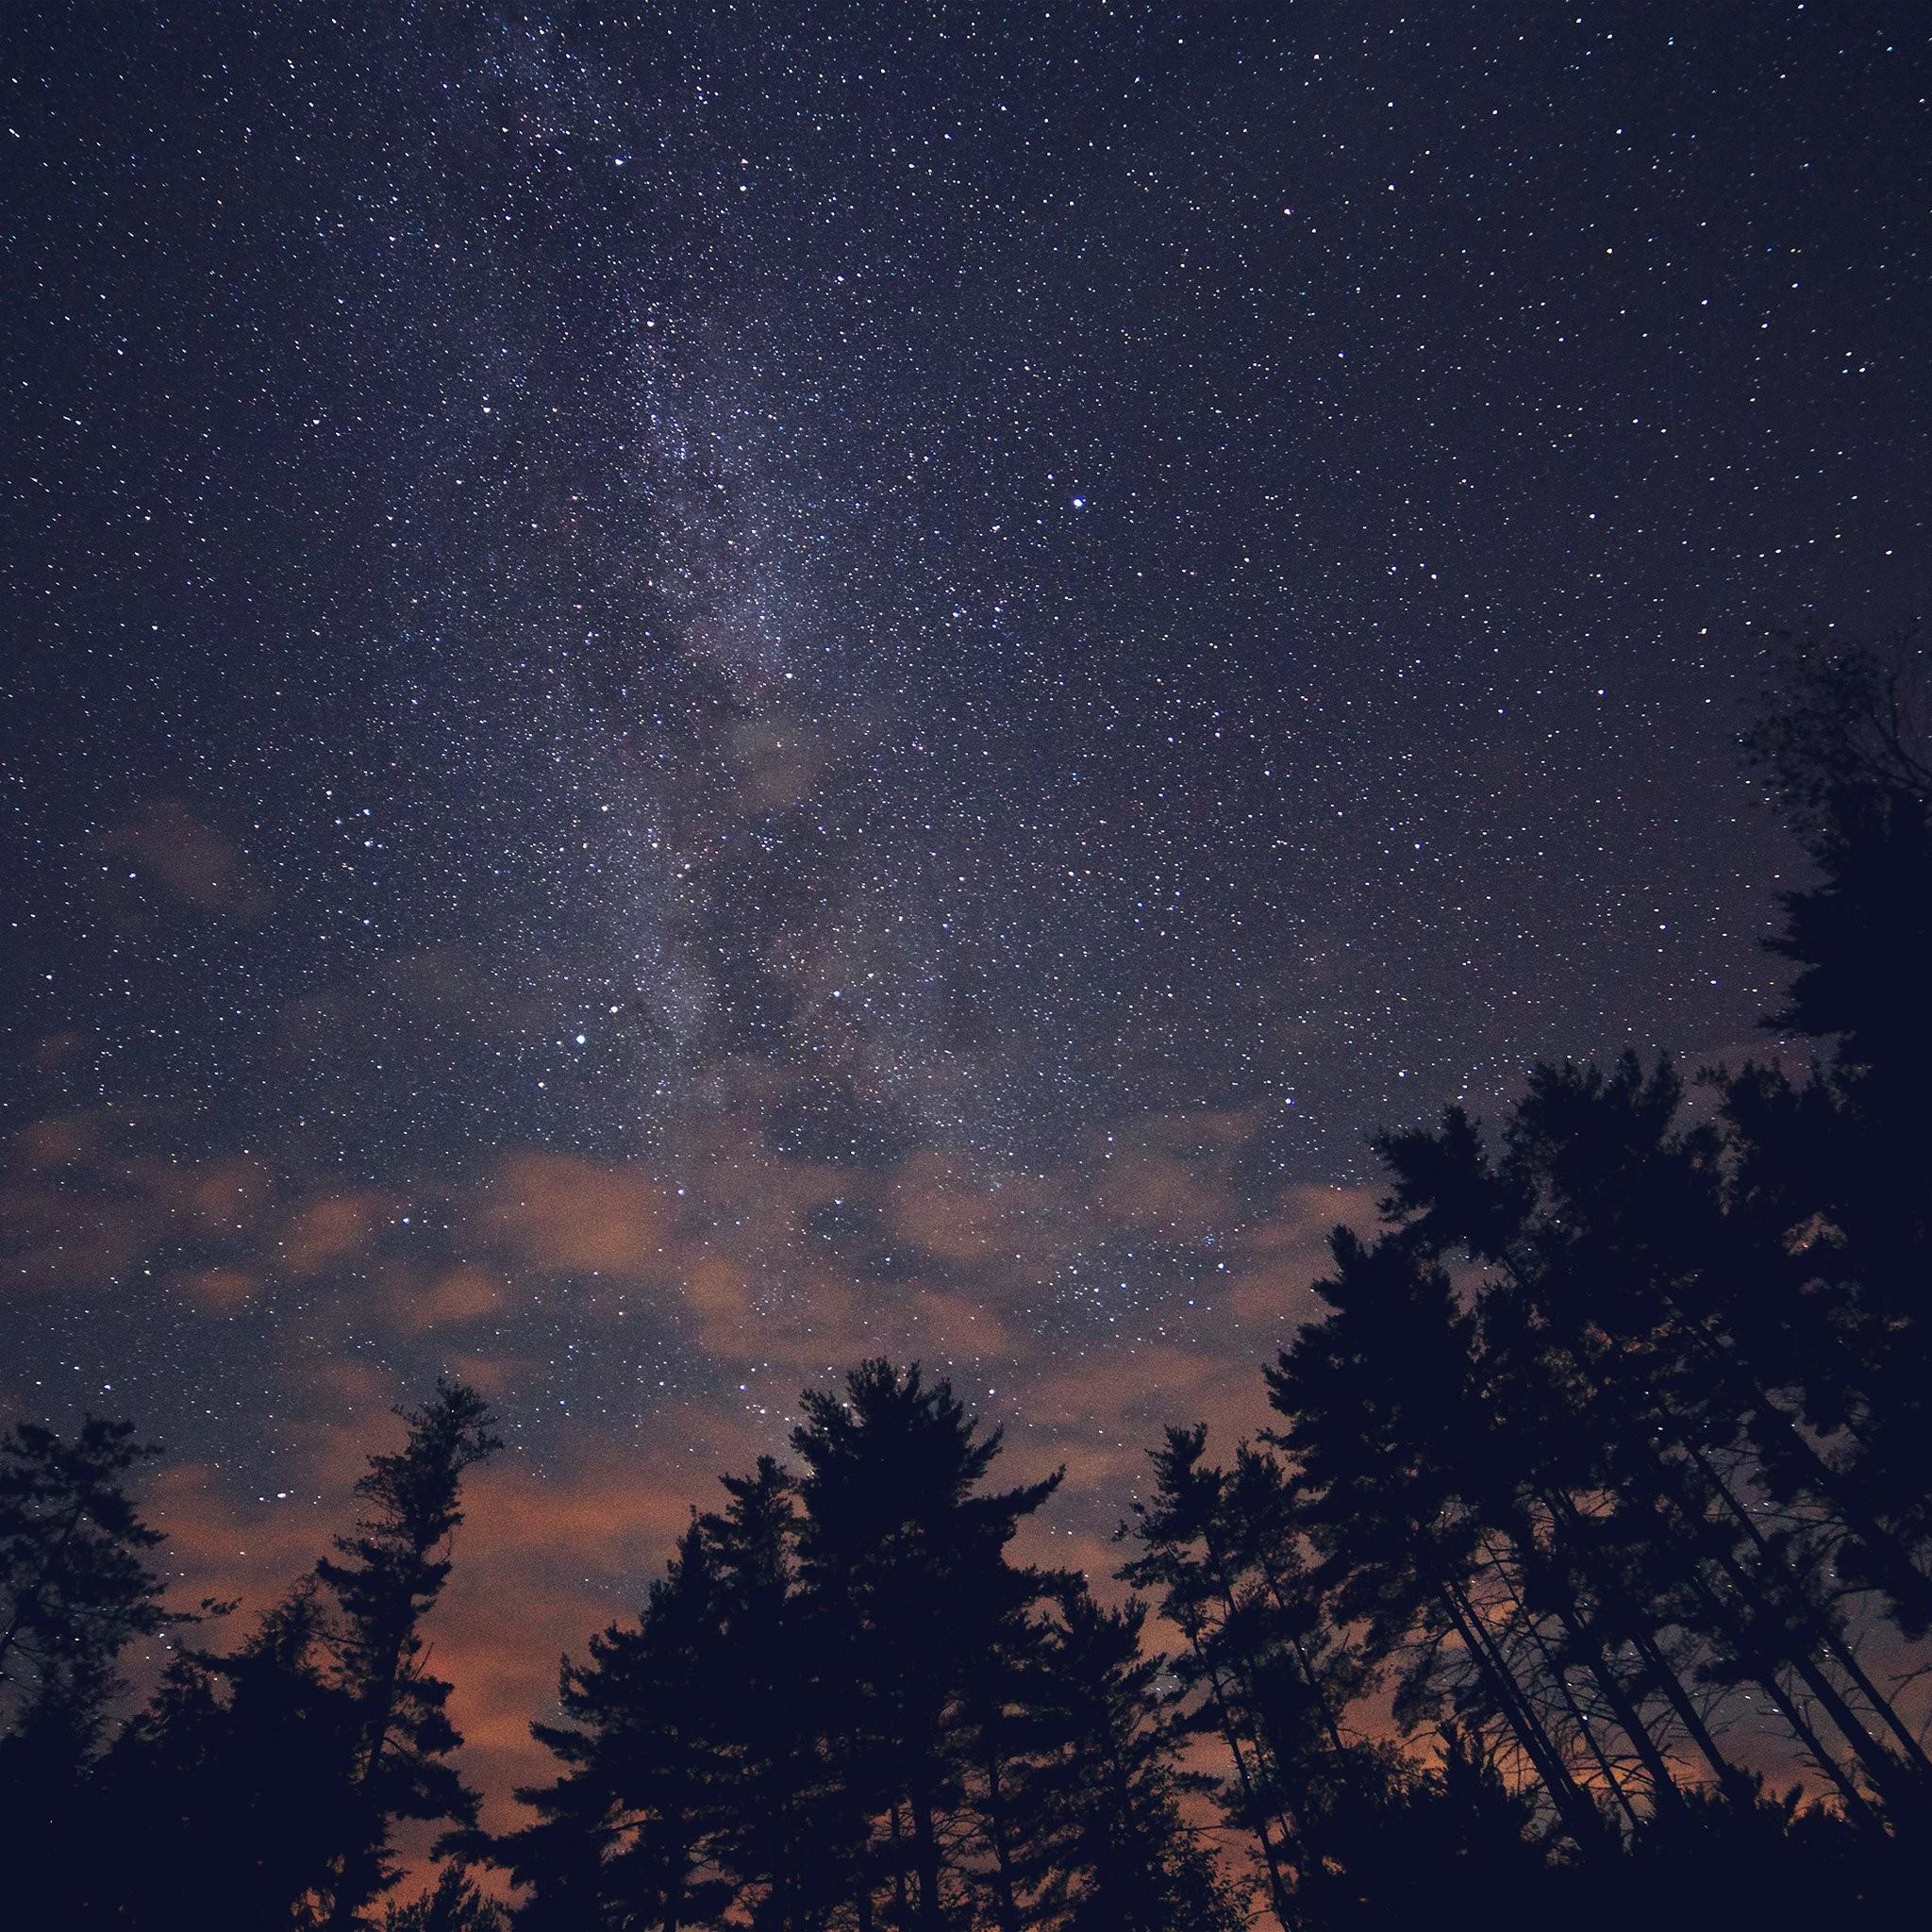 … stars ipad wallpapers iphone wallpapers ipad wallpapers one; beautiful  night …